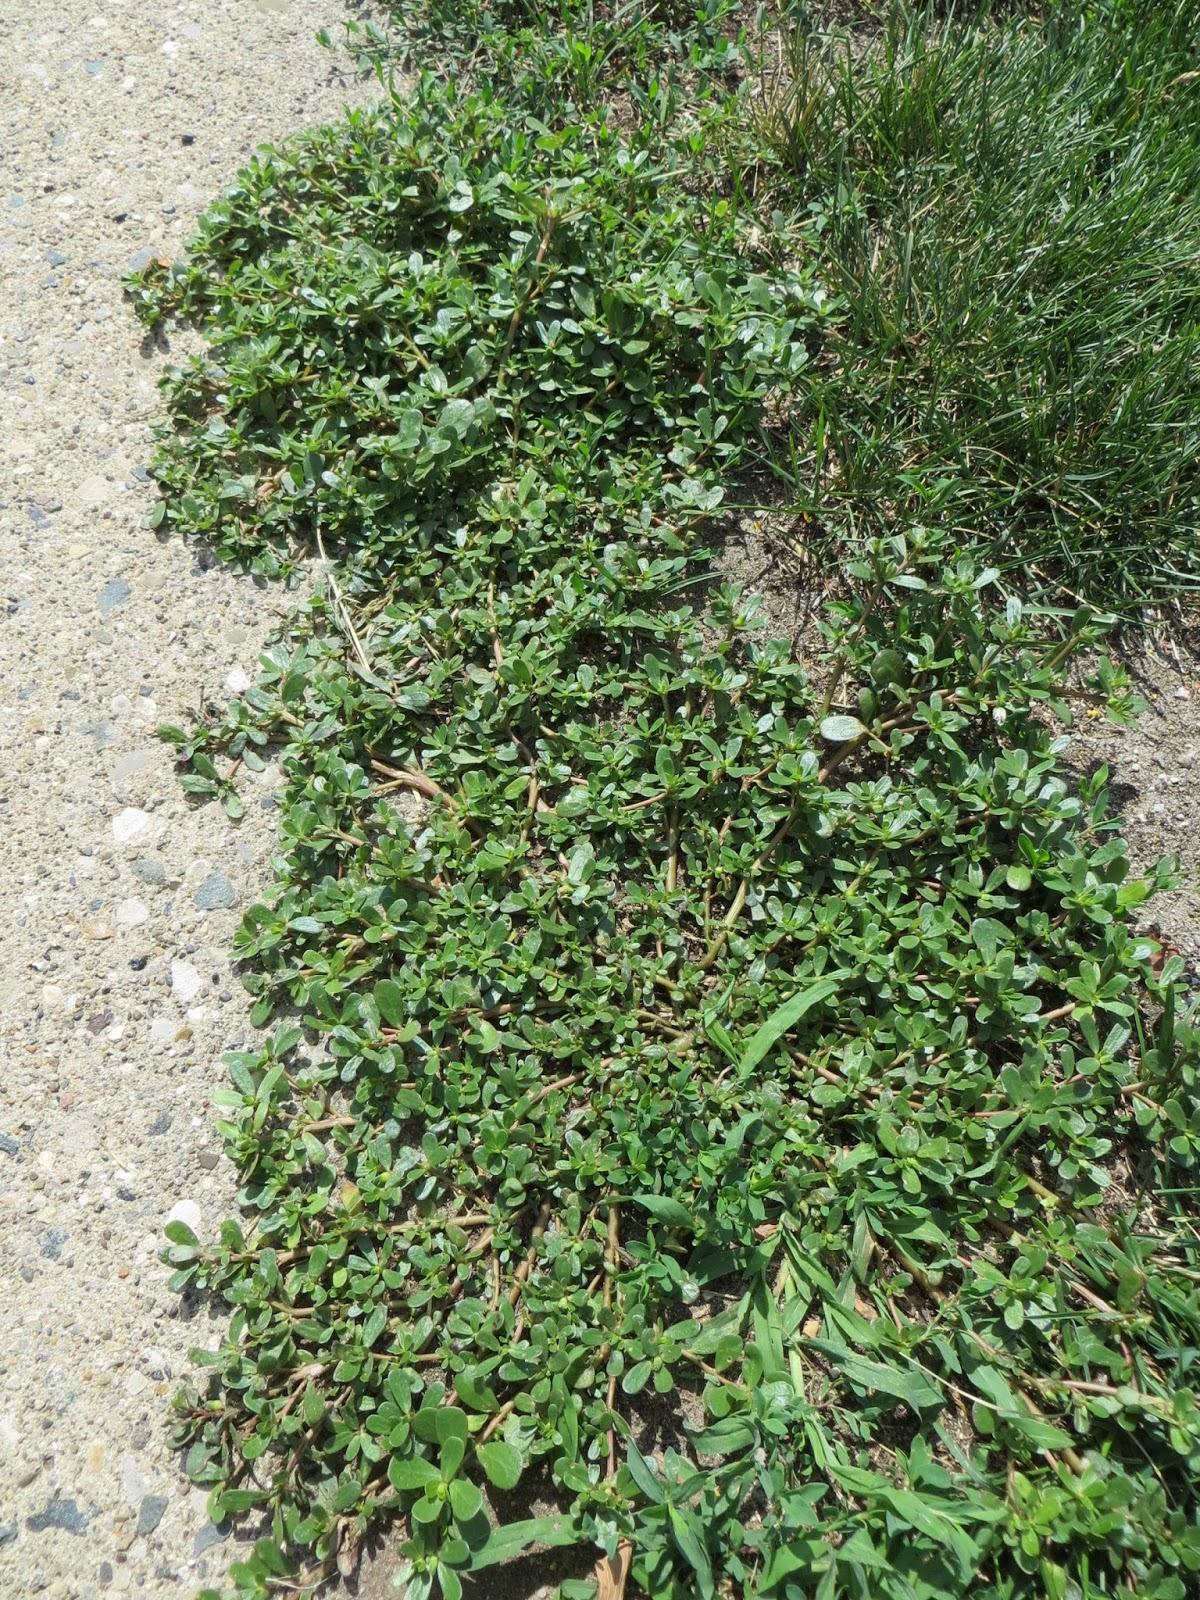 Growing Purslane How To Grow Edible Purslane In The Garden: NMSU Plant Clinic: Common Purslane: A Troublesome Summer